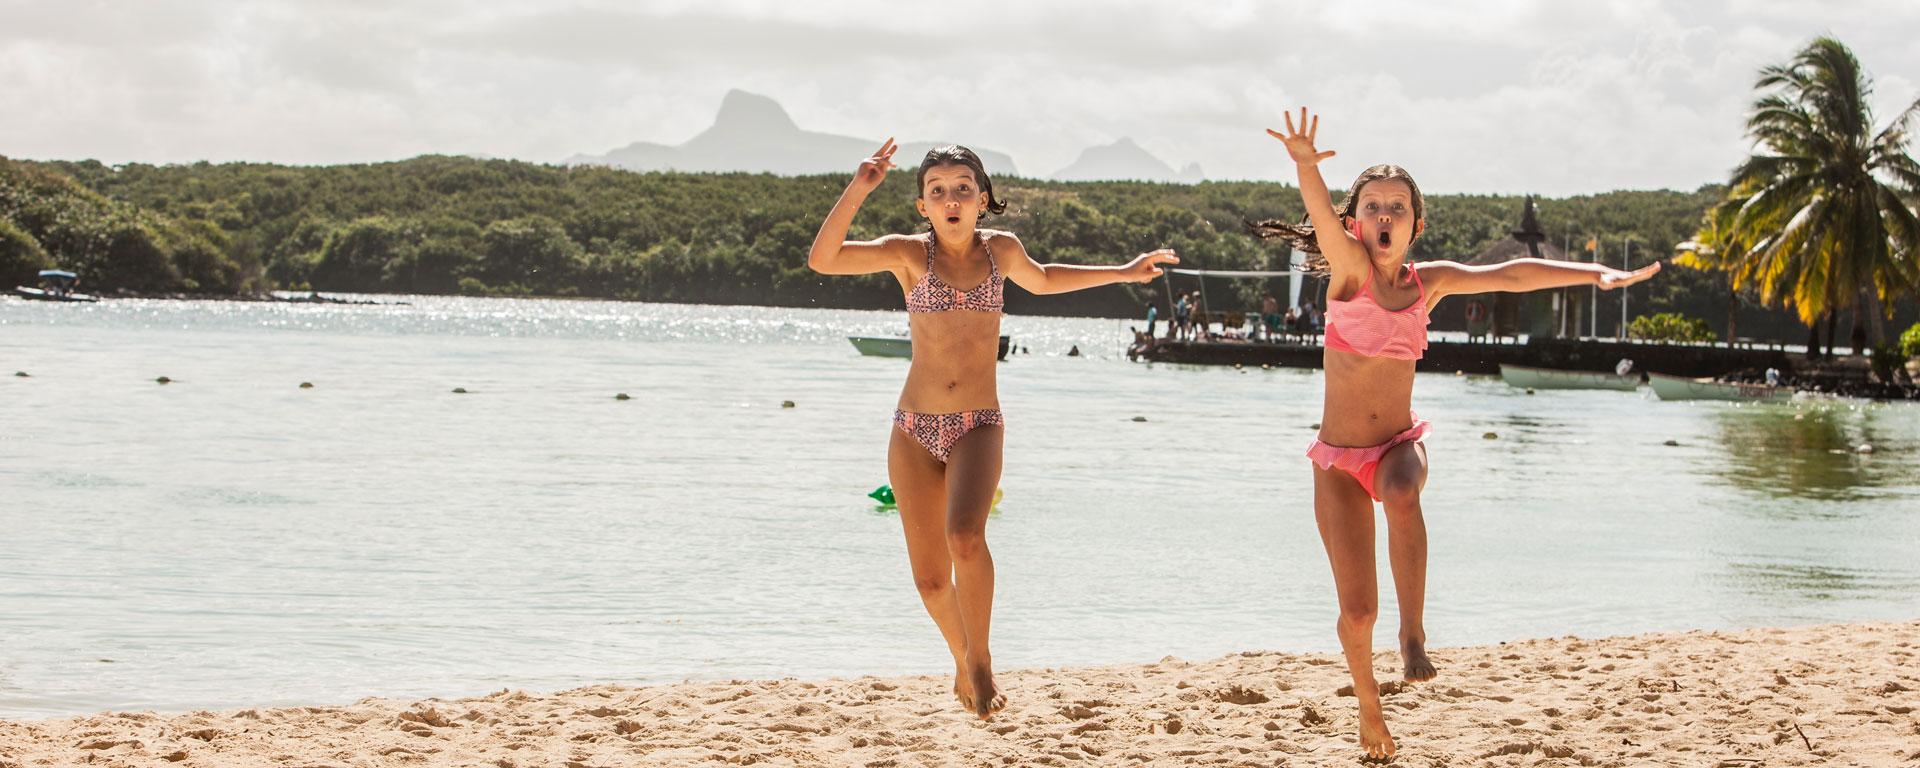 beachcomber familymoon image2